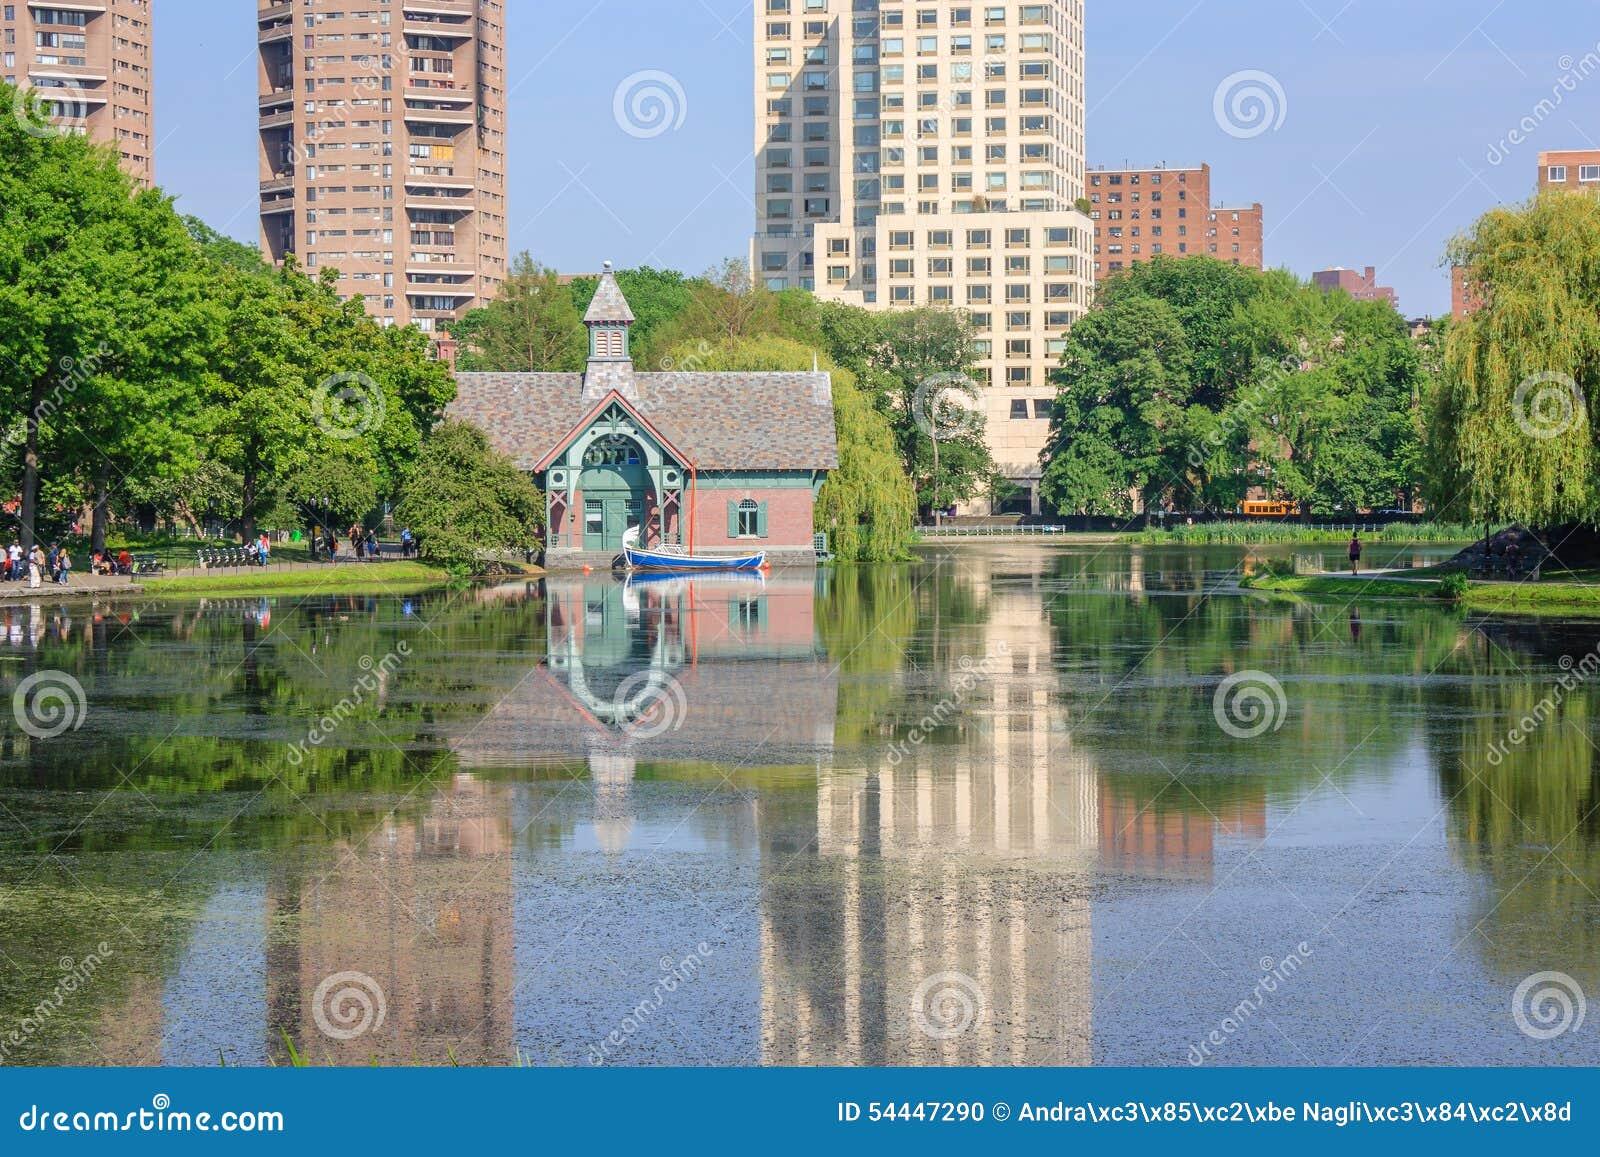 Centro di scoperta del Charles A Dana Discovery Center - Central Park, New York City